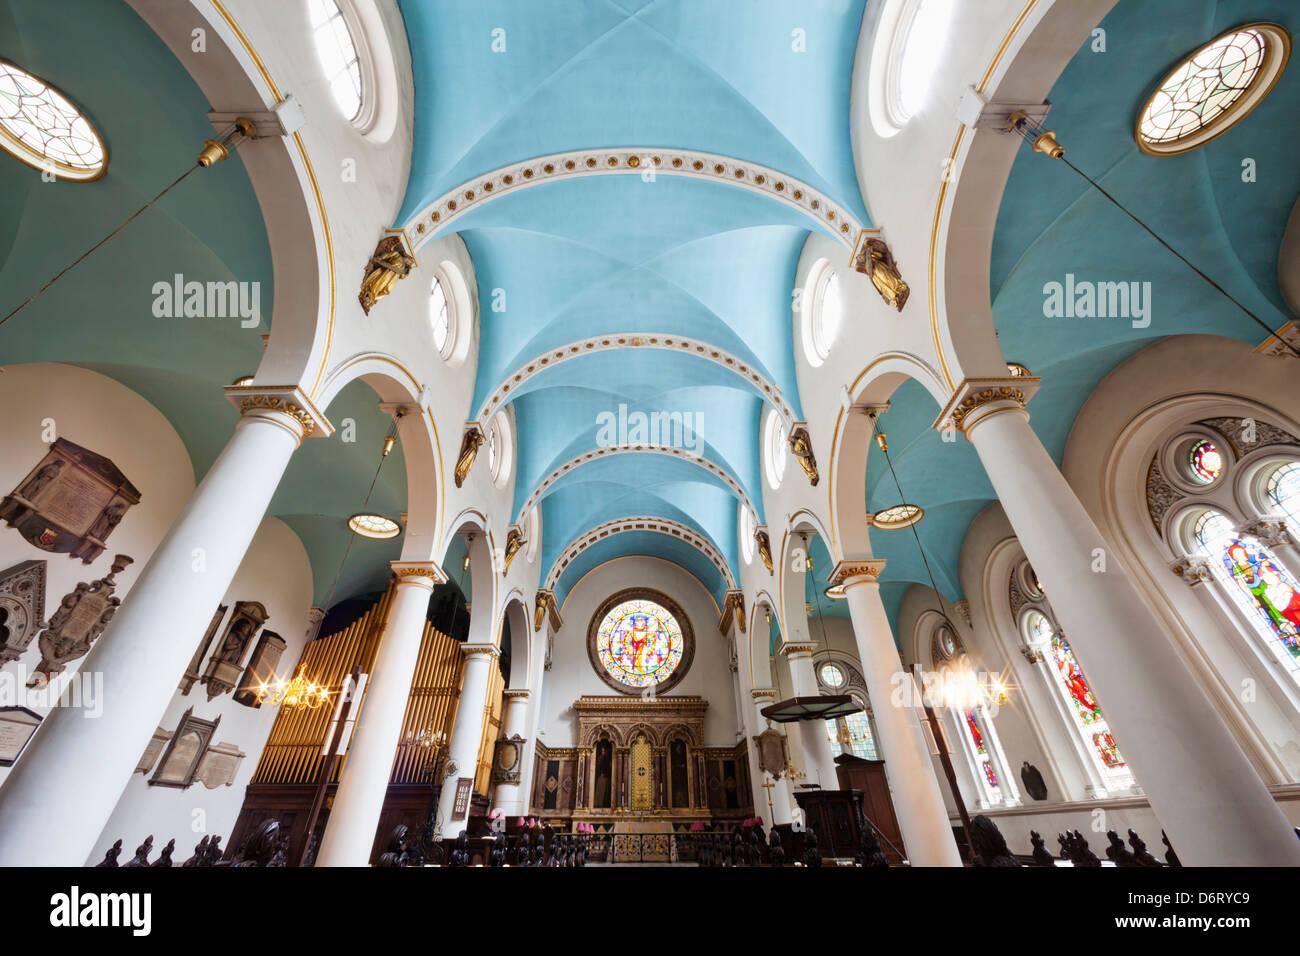 England,London,The City,St.Michael Cornhill Church - Stock Image